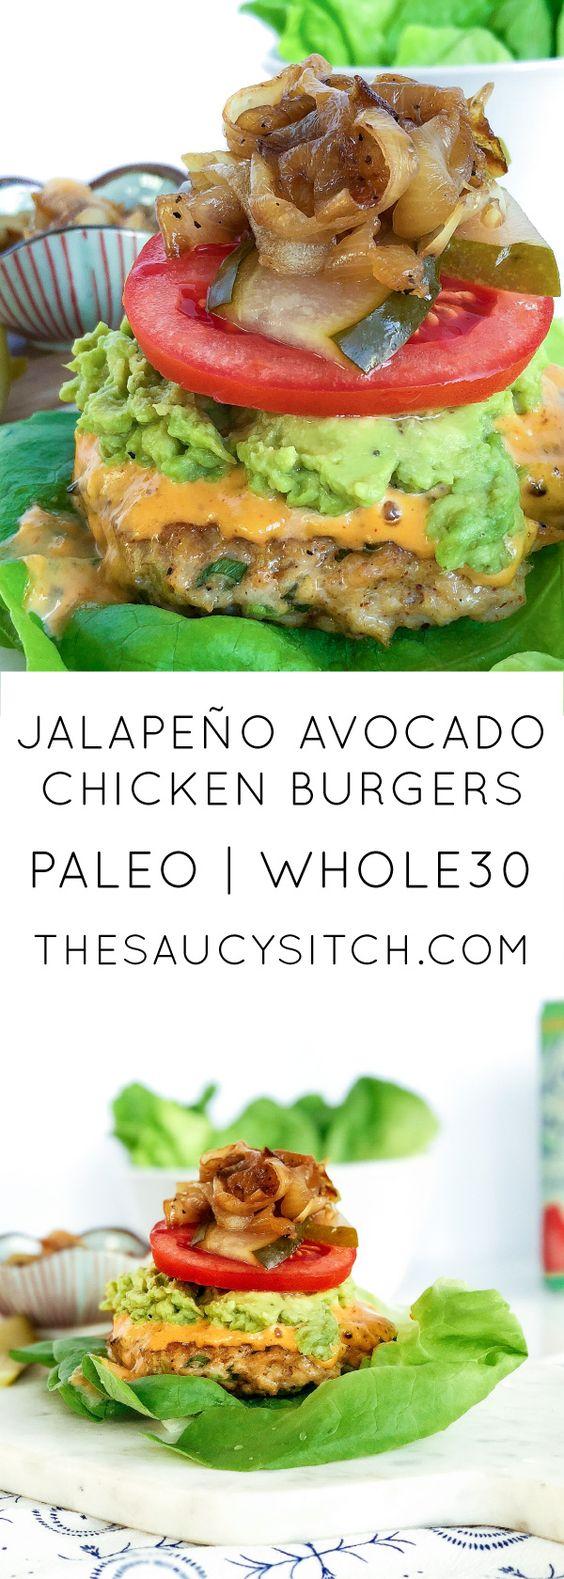 Jalapeno Avocado Chicken Burgers